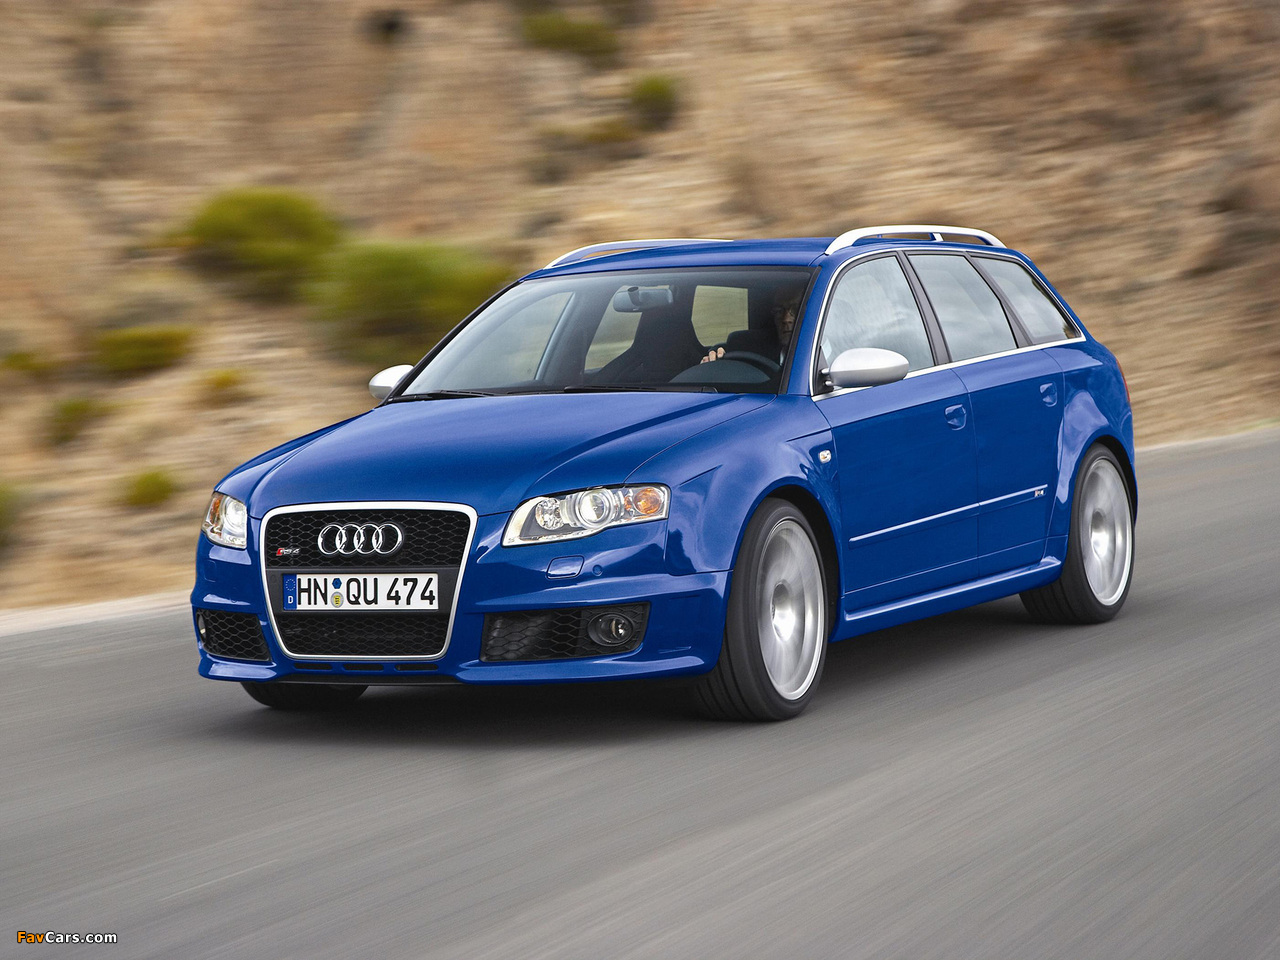 Audi Rs4 Avant B7 8e 2006 08 Wallpapers 1280x960